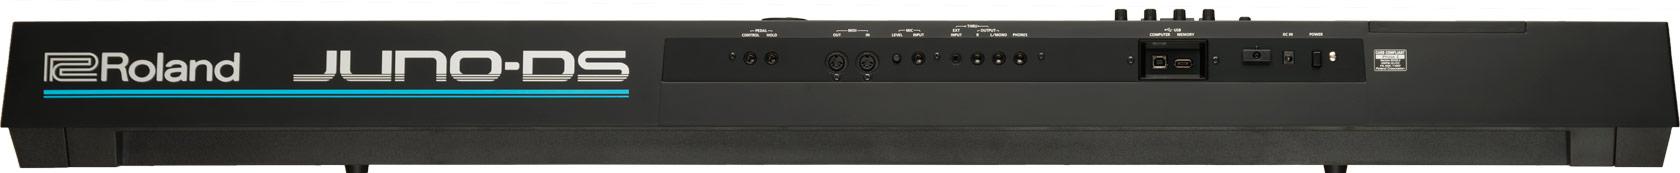 ROLAND JUNO DS-88 TASTIERA DINAMICA 88 TASTI IVORY FEEL-G + SINTETIZZATORE + MIDI + USB + EFFETTI